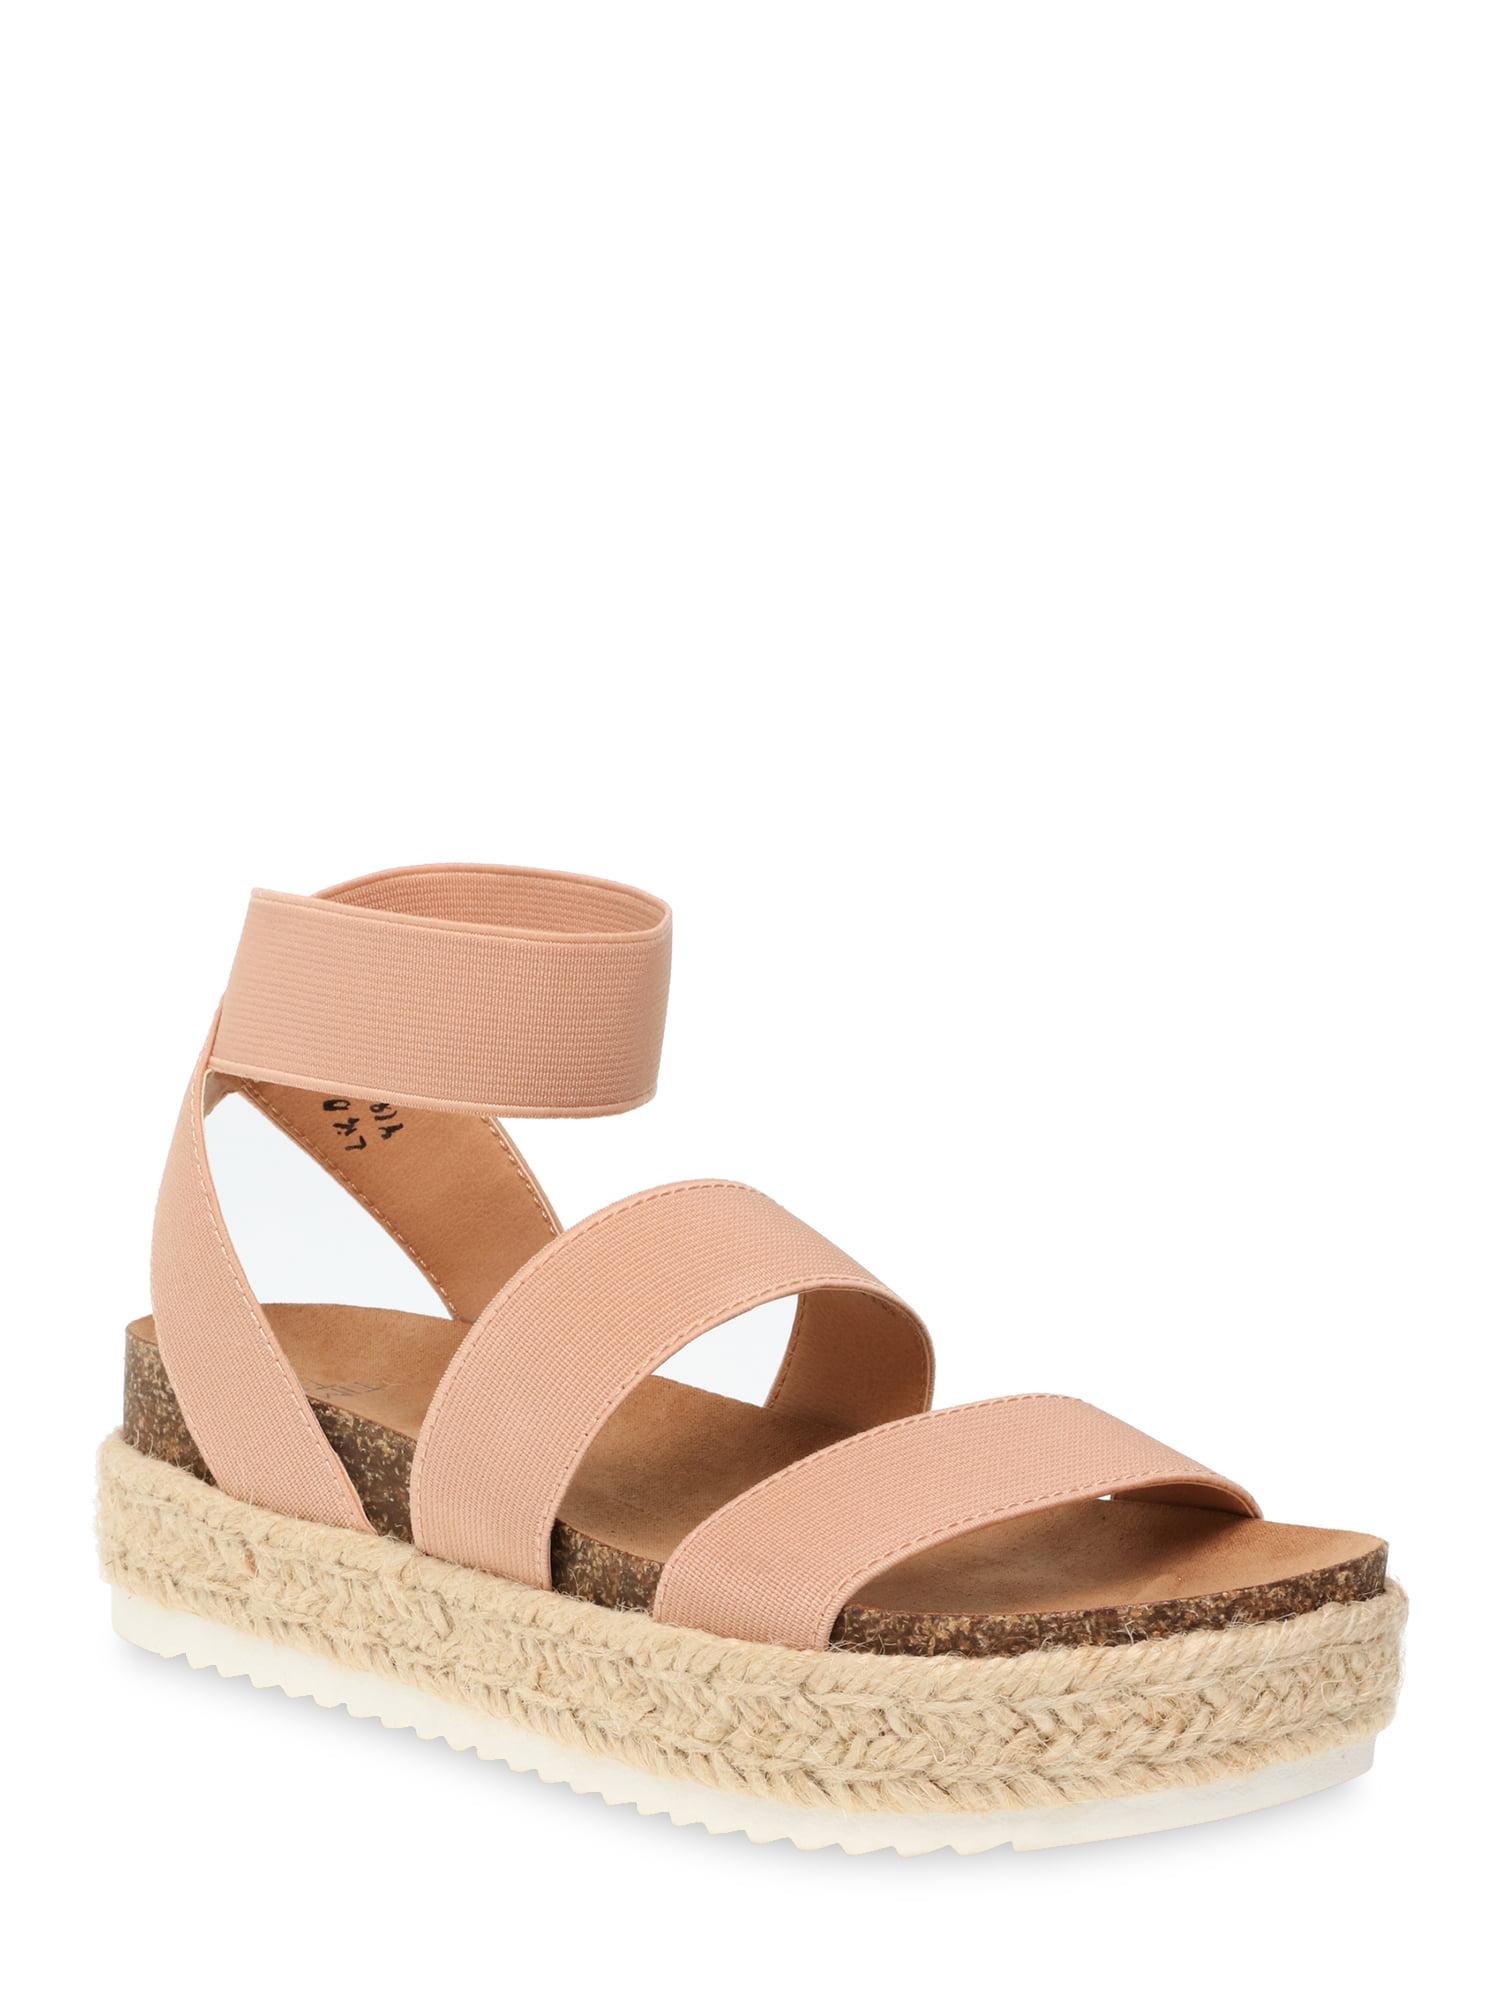 flatform sandals wide